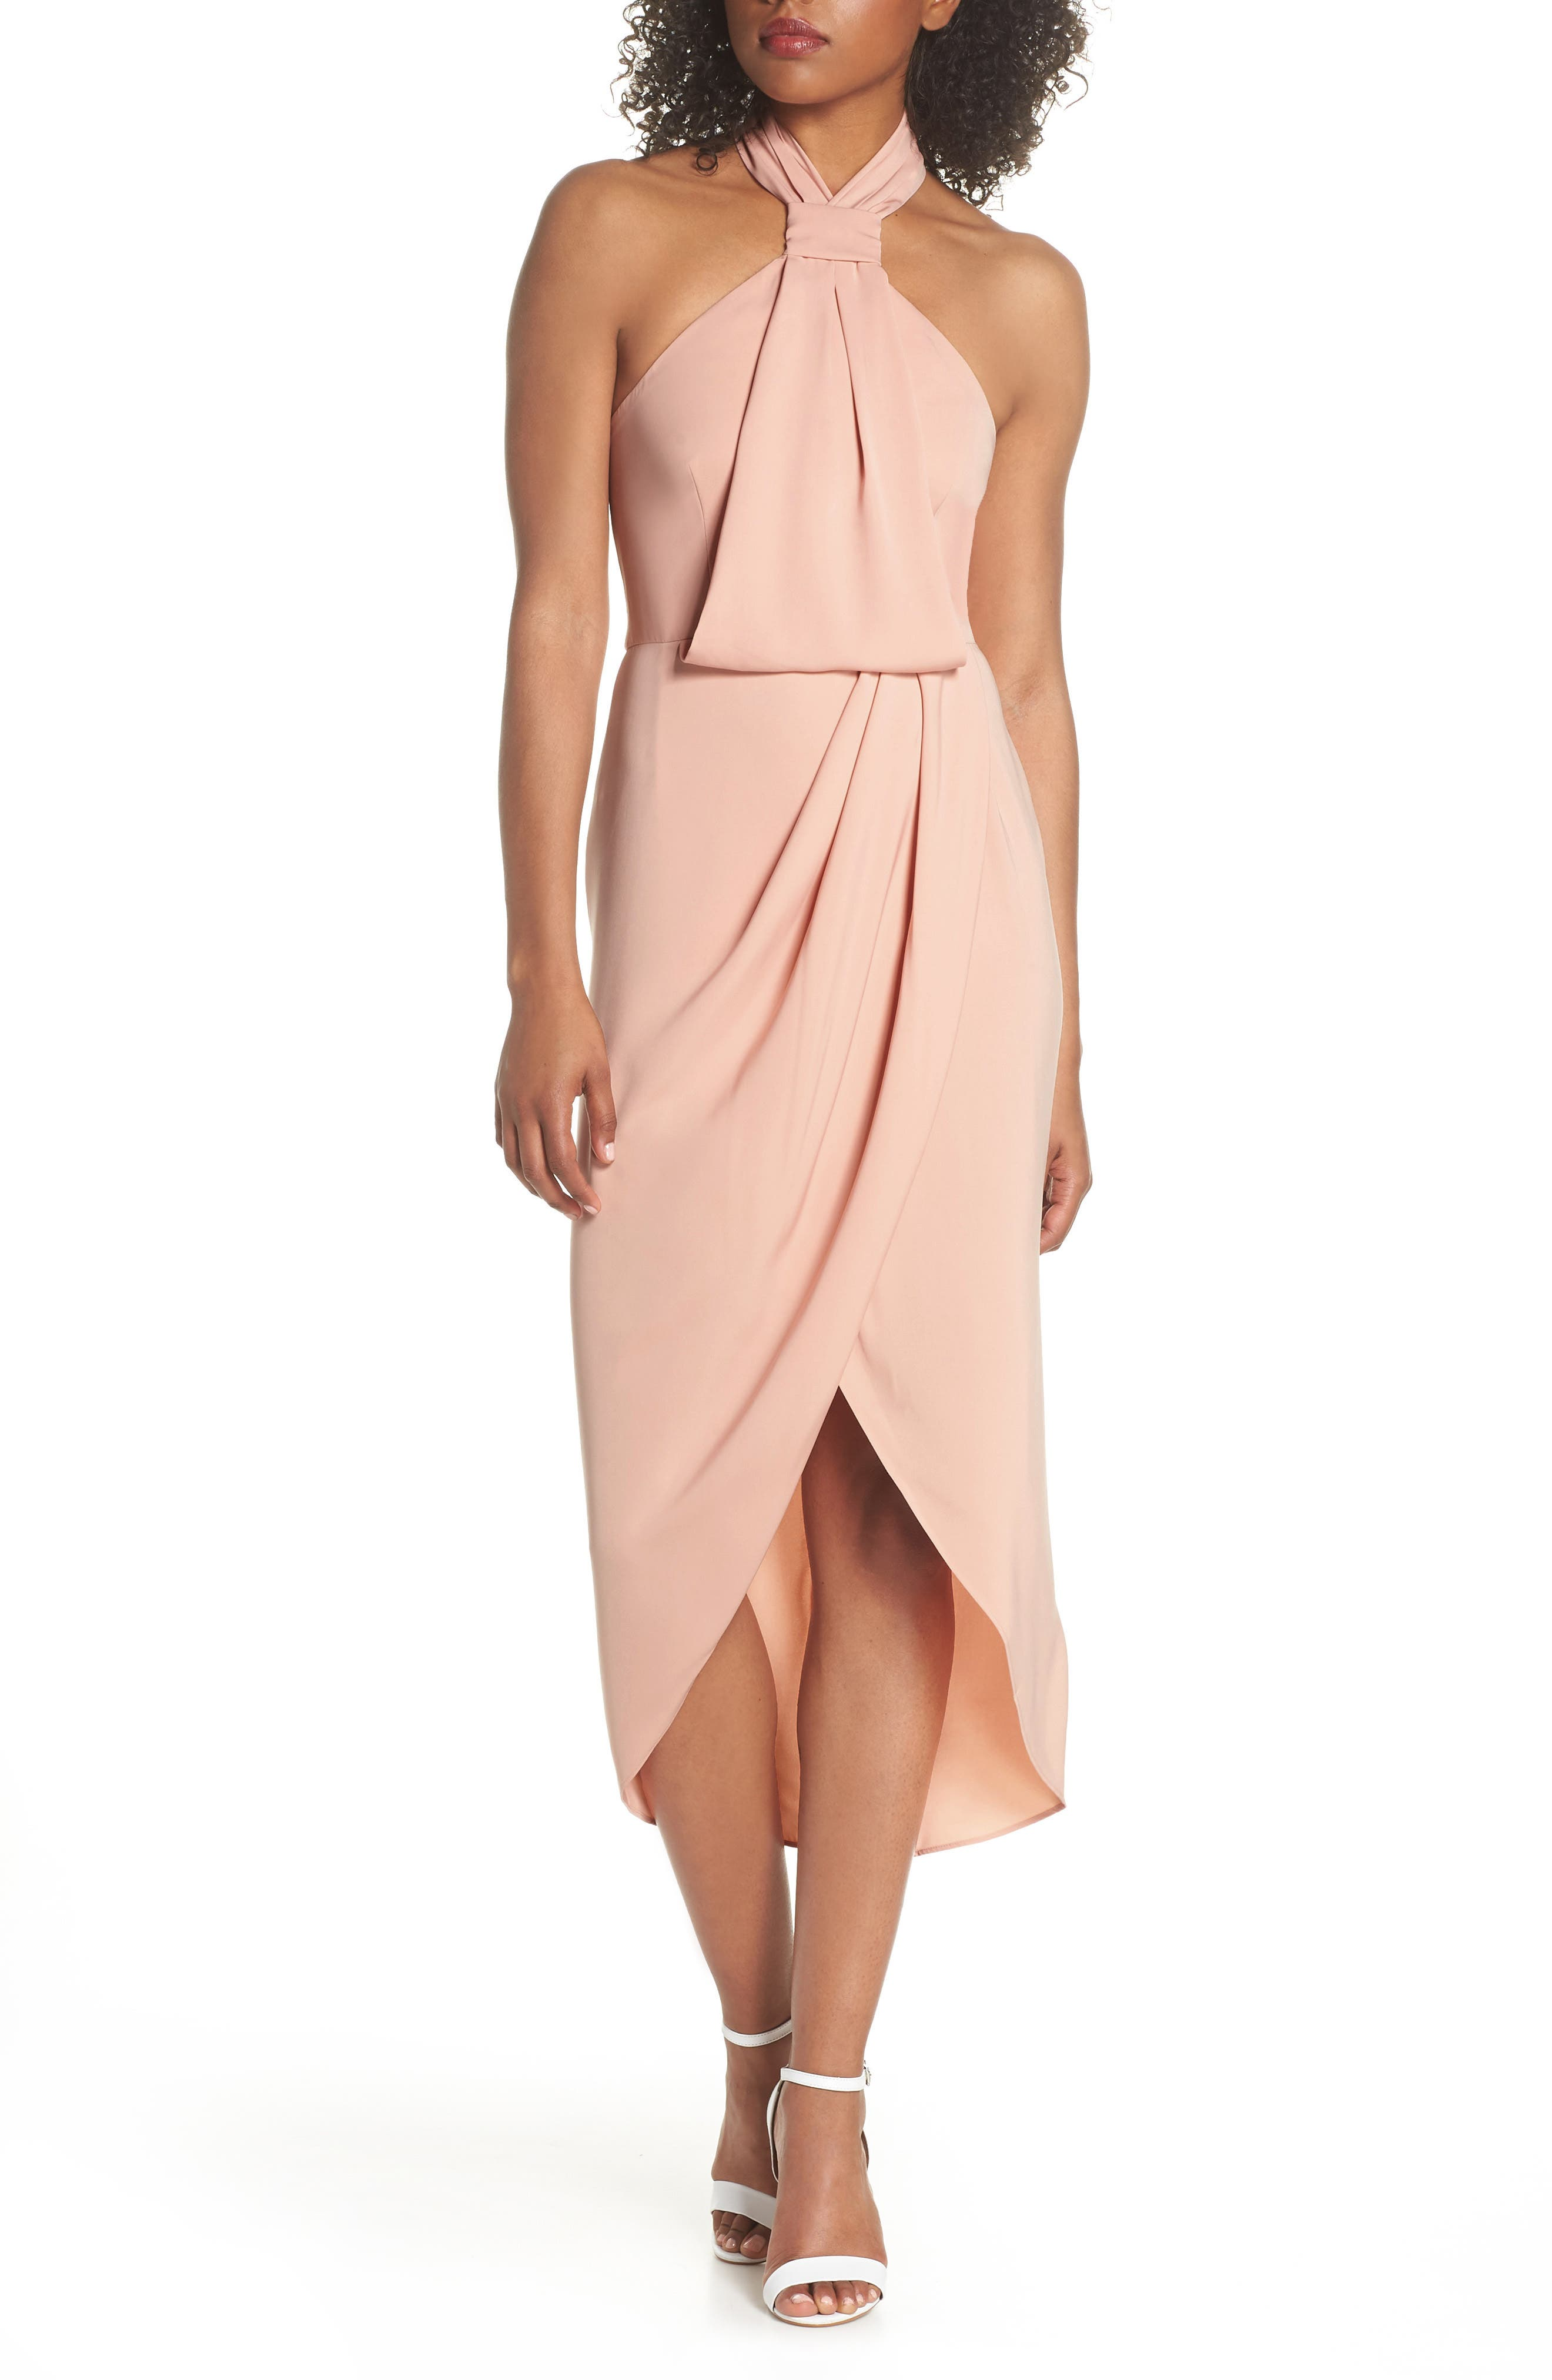 5f5770d7bf8 Shona Joy Knotted Tulip Hem Midi Dress